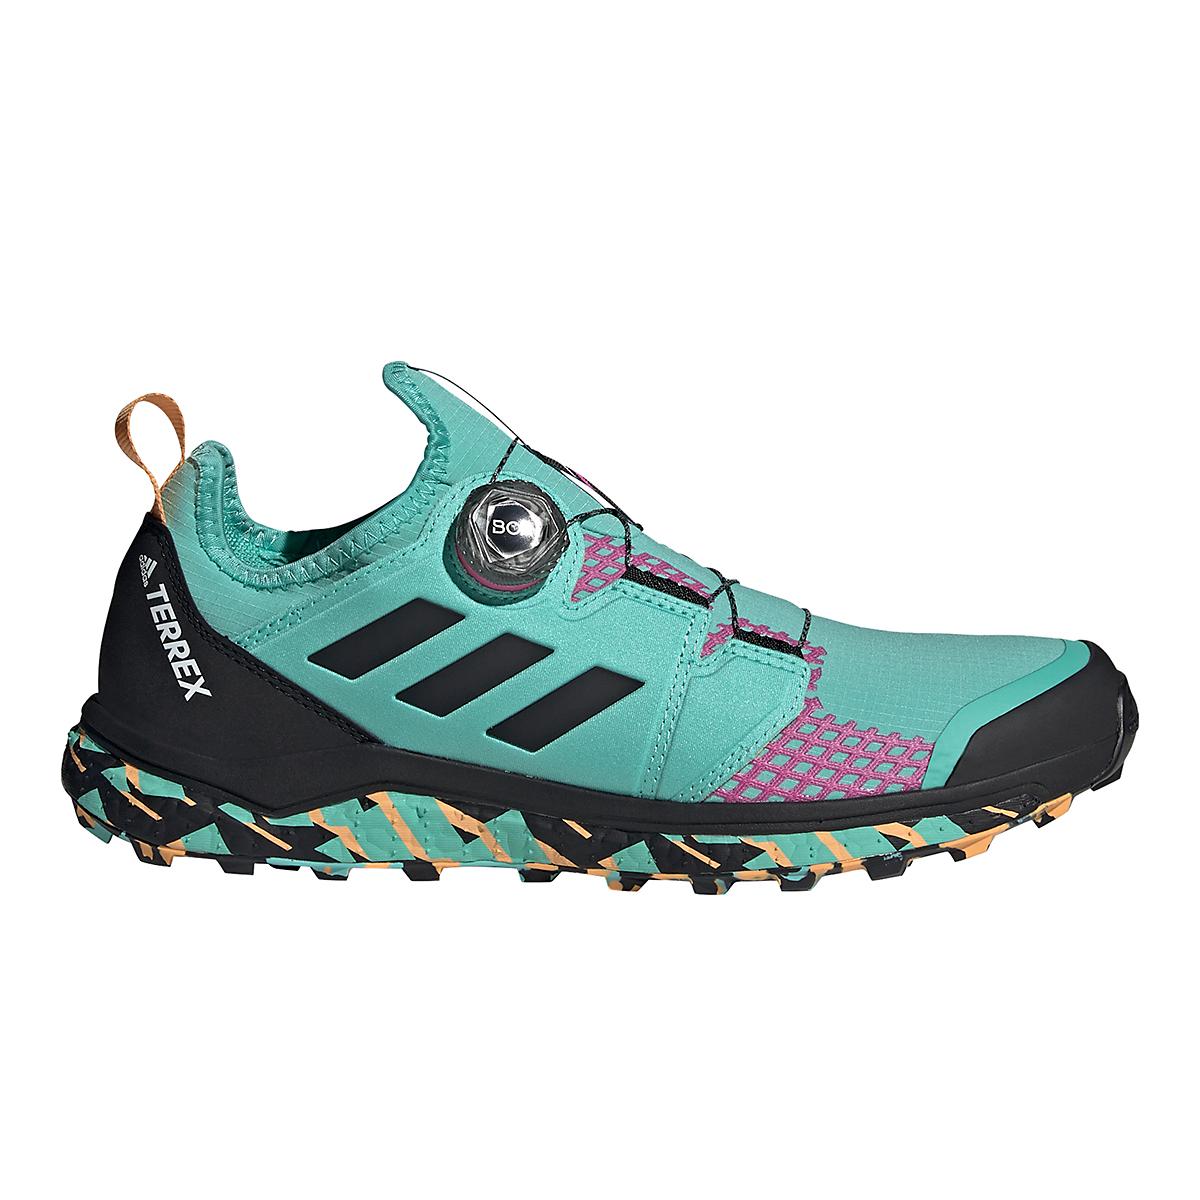 Men's Adidas Terrex Agravic BOA Trail Running Shoe - Color: Acid Mint/Core Black/Screaming Pink - Size: 6 - Width: Regular, Acid Mint/Core Black/Screaming Pink, large, image 1